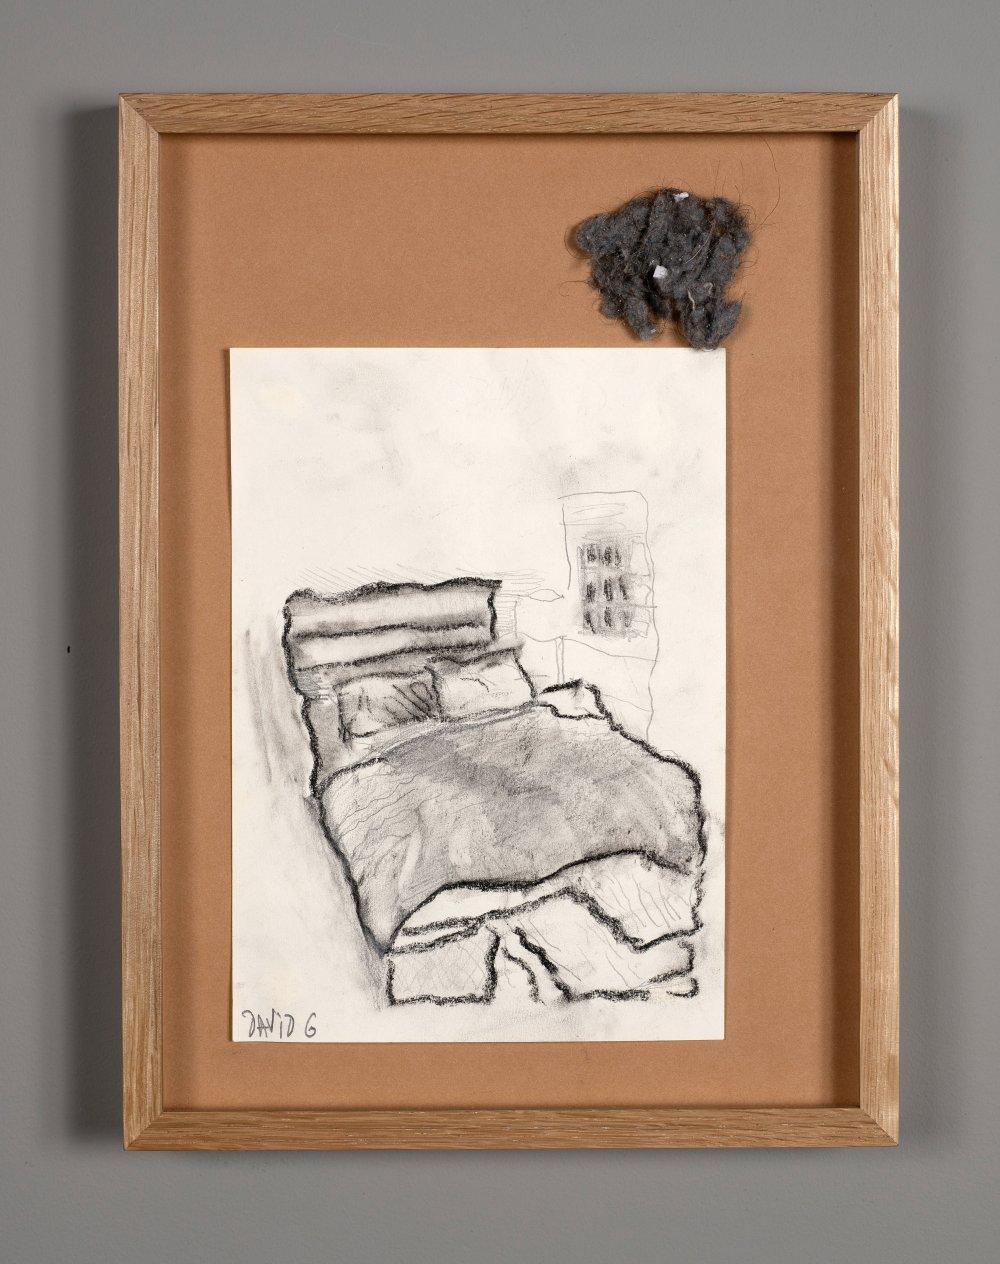 David's Bed